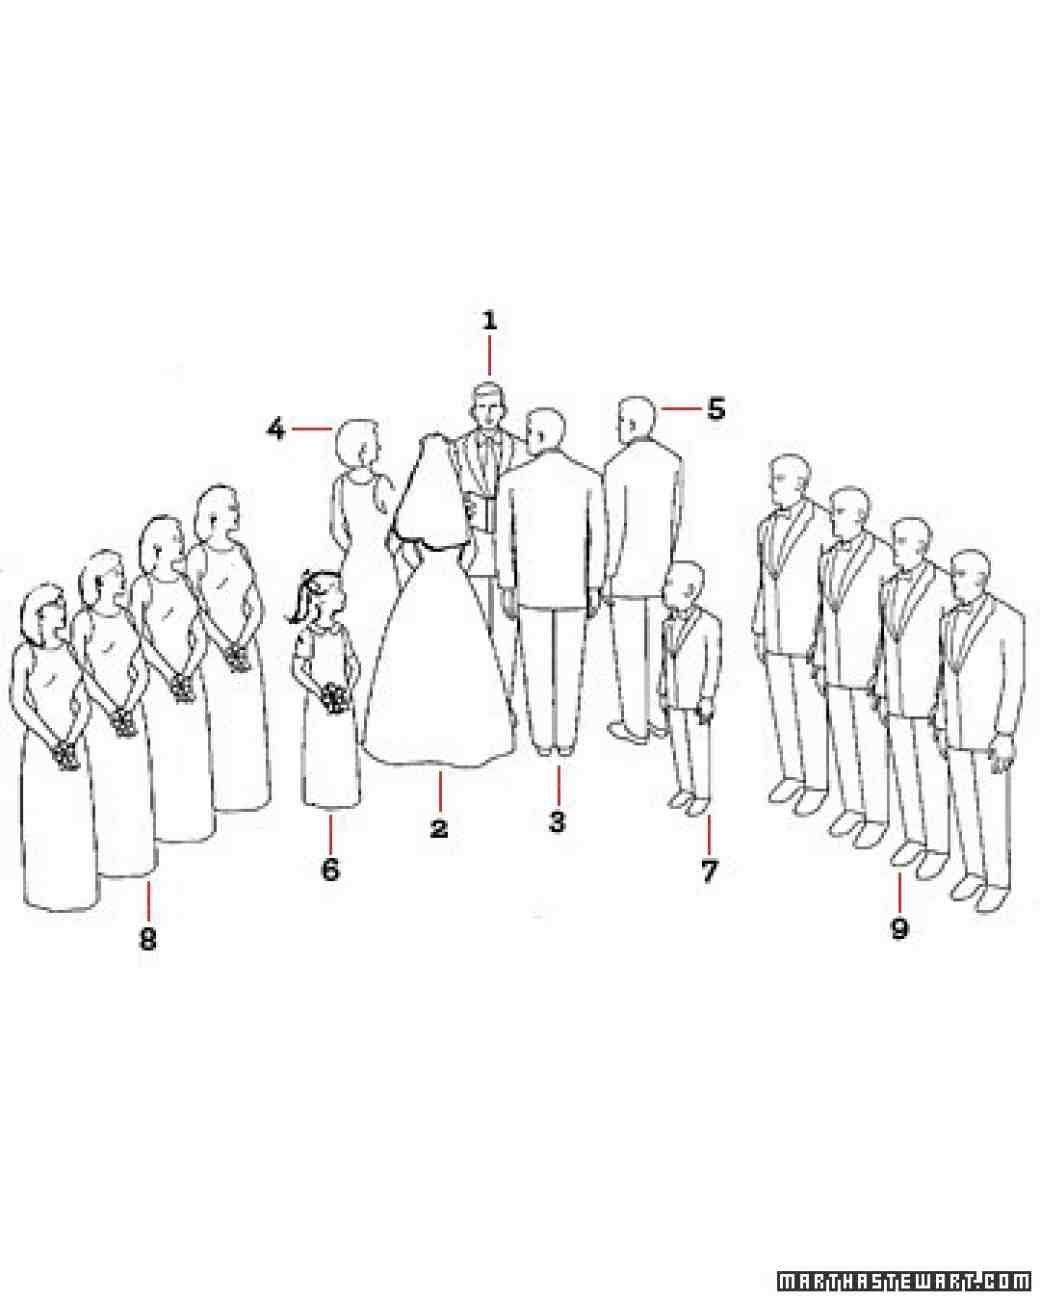 Diagram Your Big Day: Christian Wedding Ceremony Basics